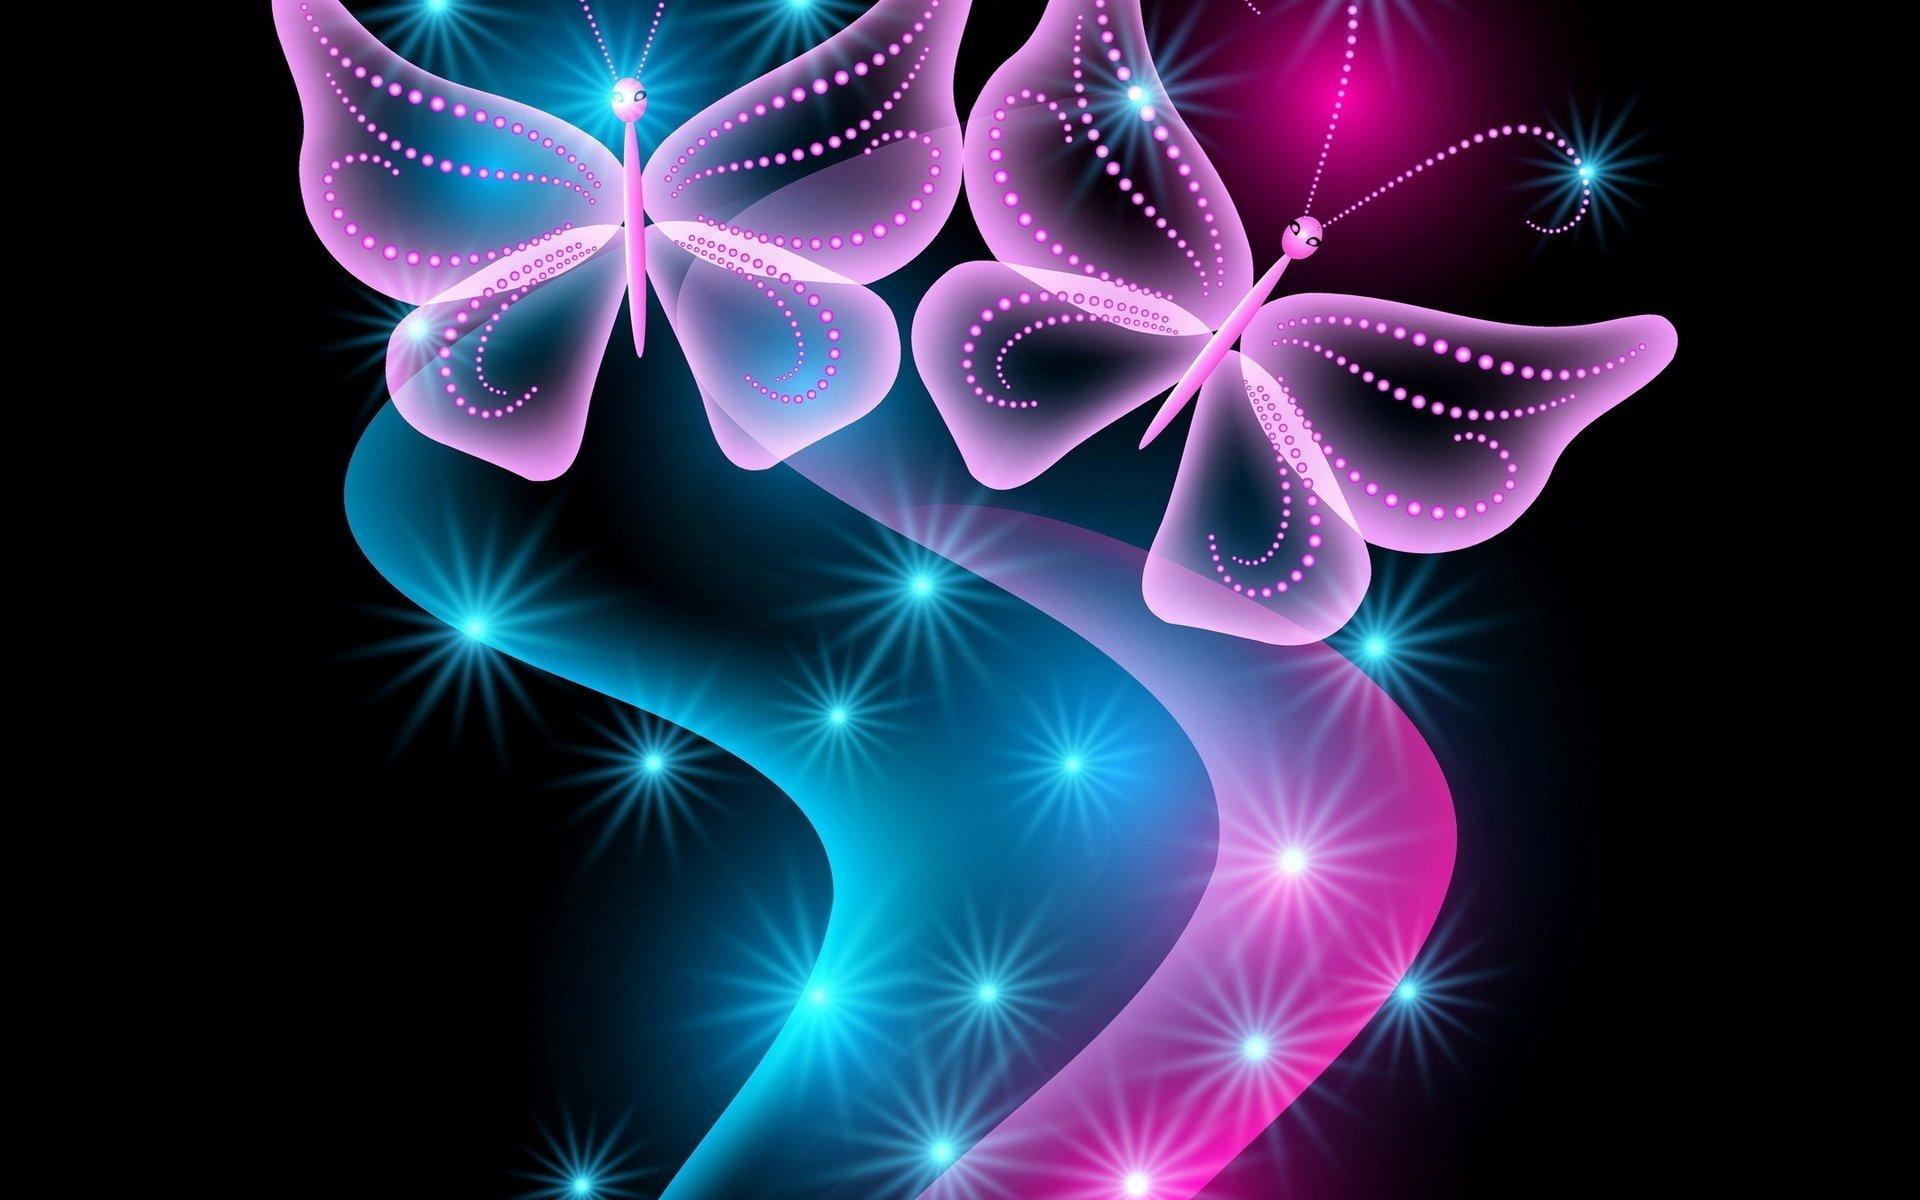 Neon Abstract Butterflies Papel De Parede HD